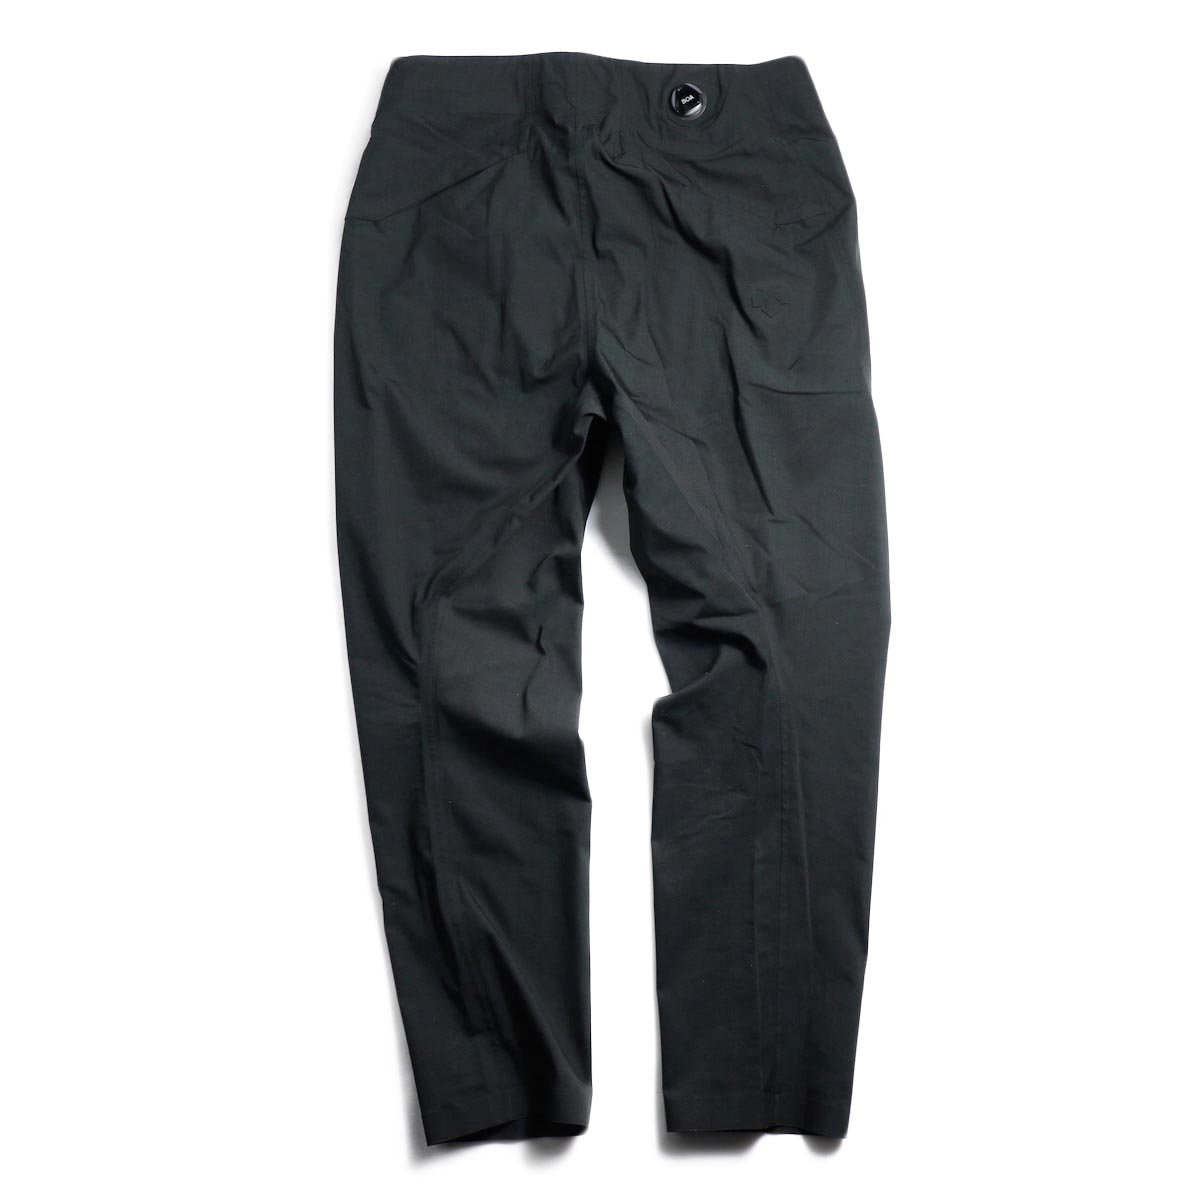 DESCENTE ALLTERAIN / Boa Long Pants Tapered Fit -Black 背面